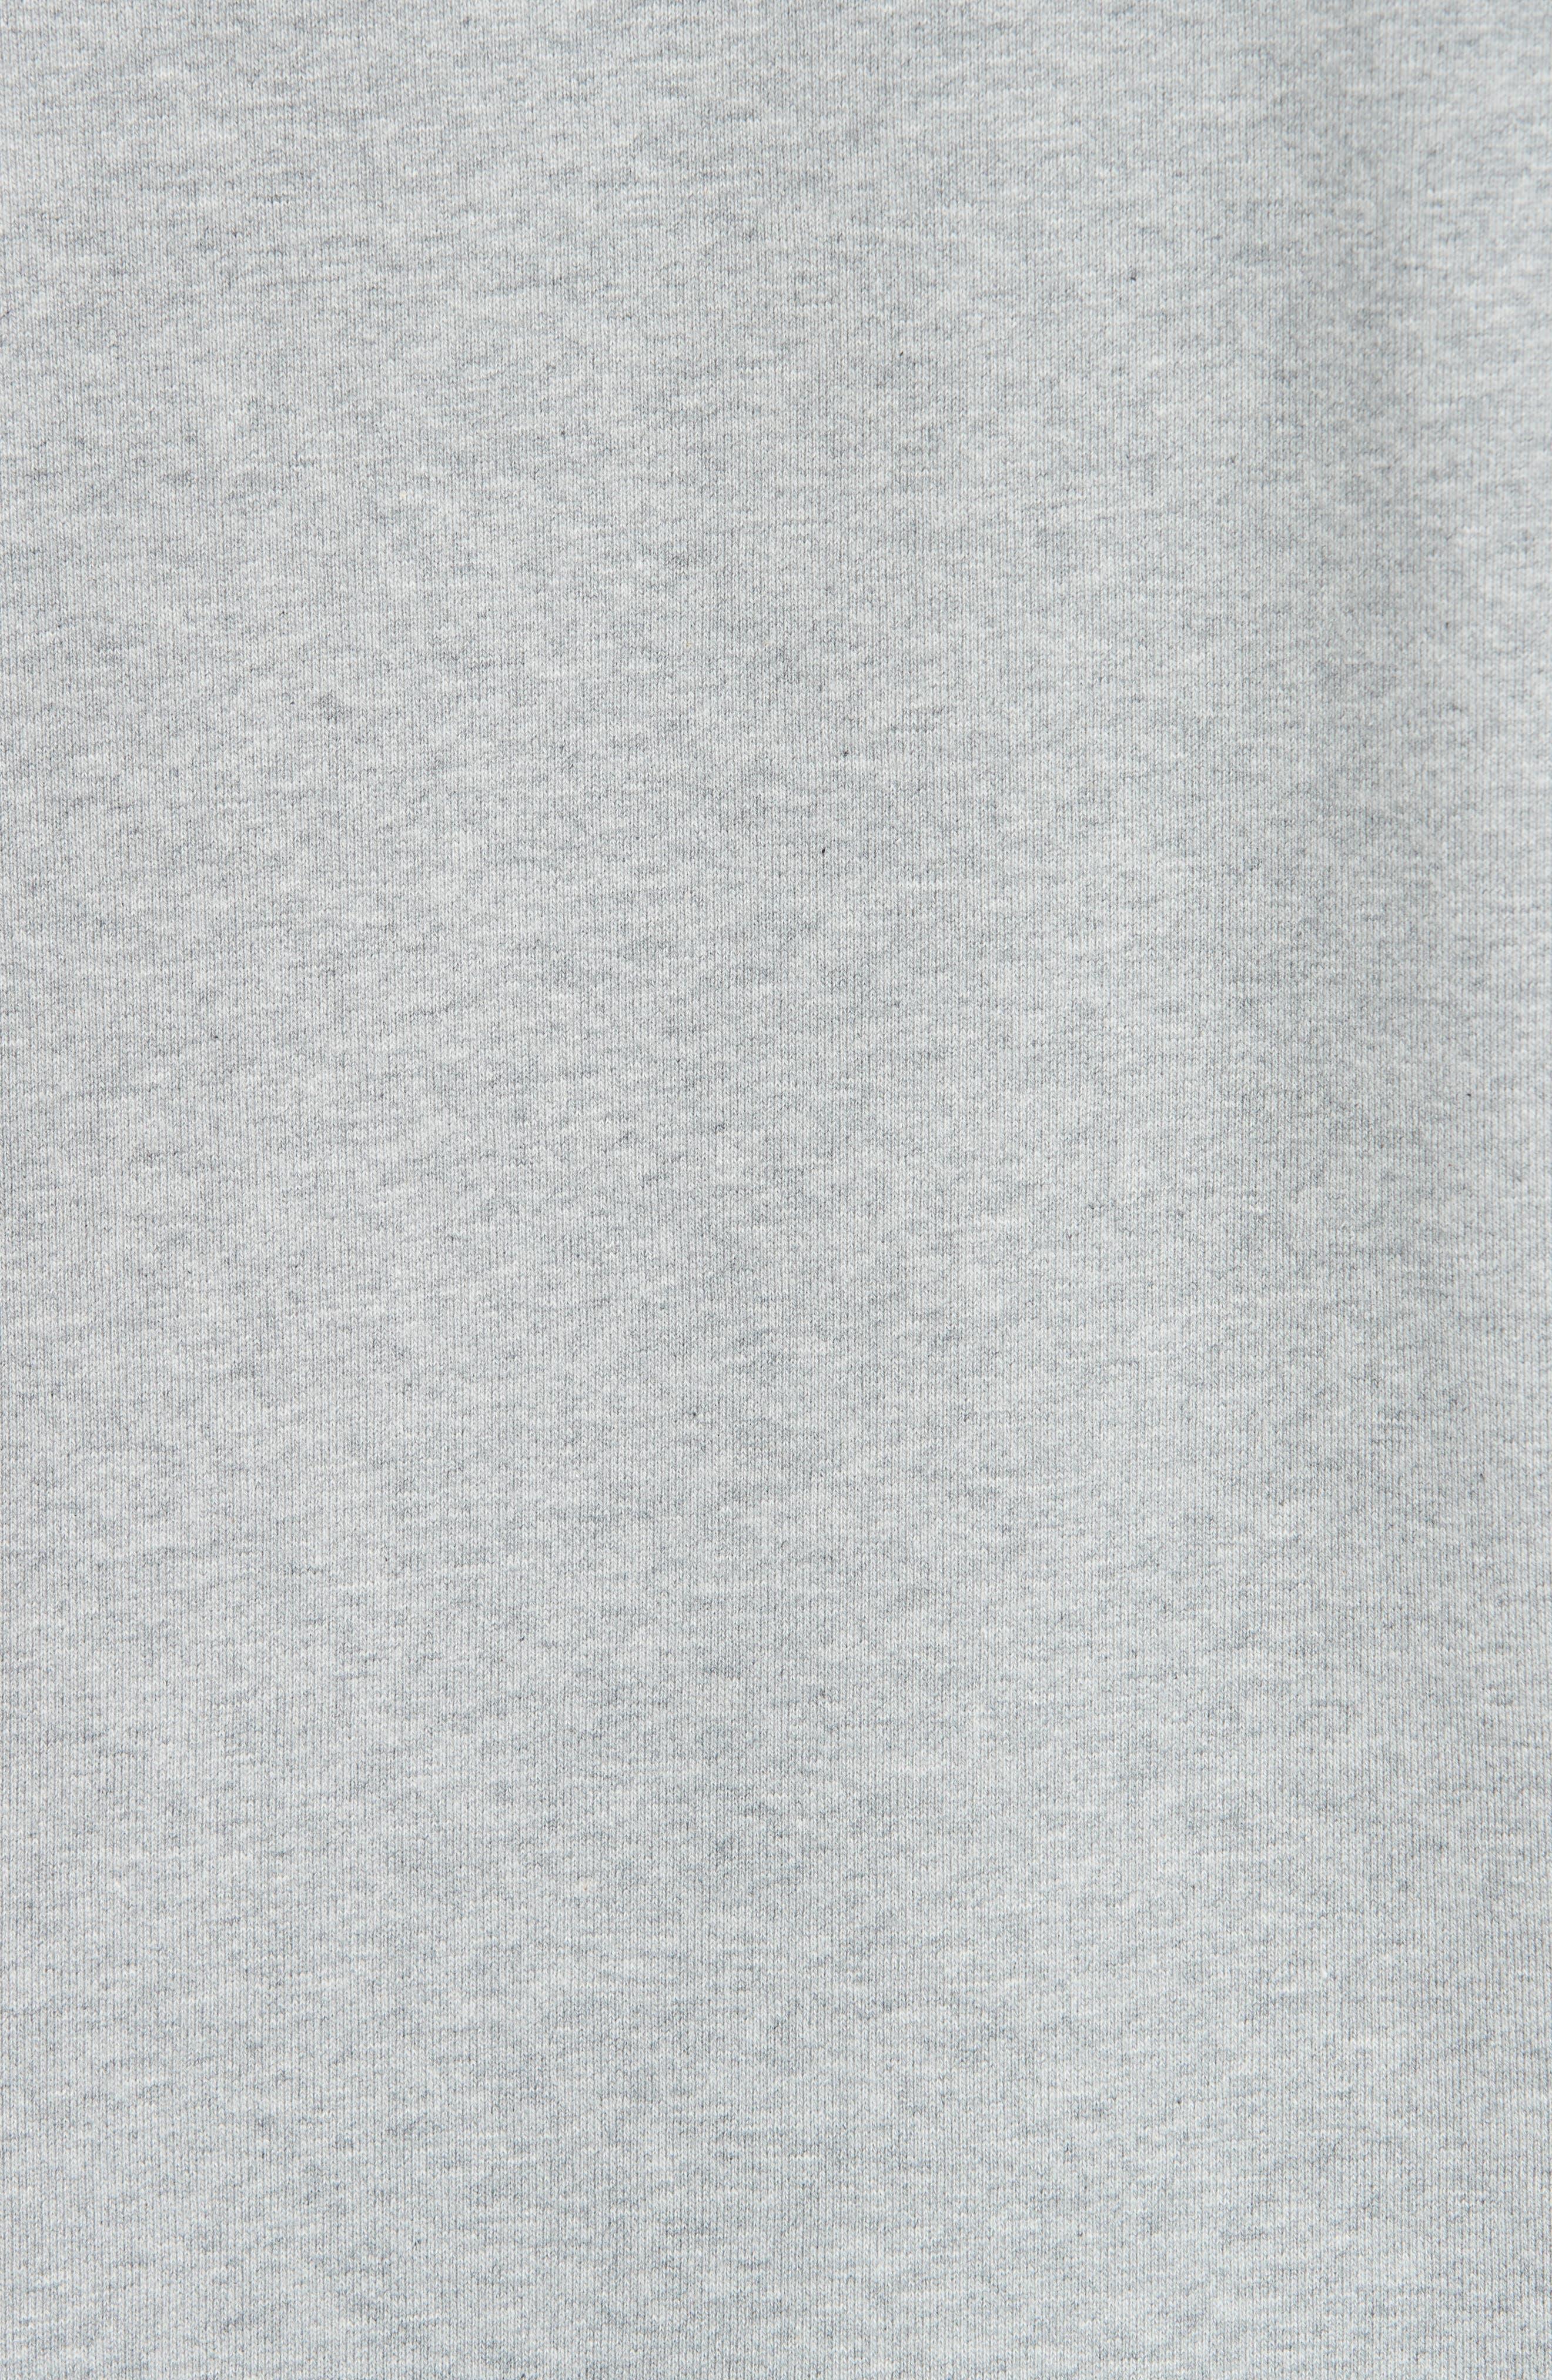 Embroidered Anagram Logo Sweatshirt,                             Alternate thumbnail 5, color,                             1120 GREY